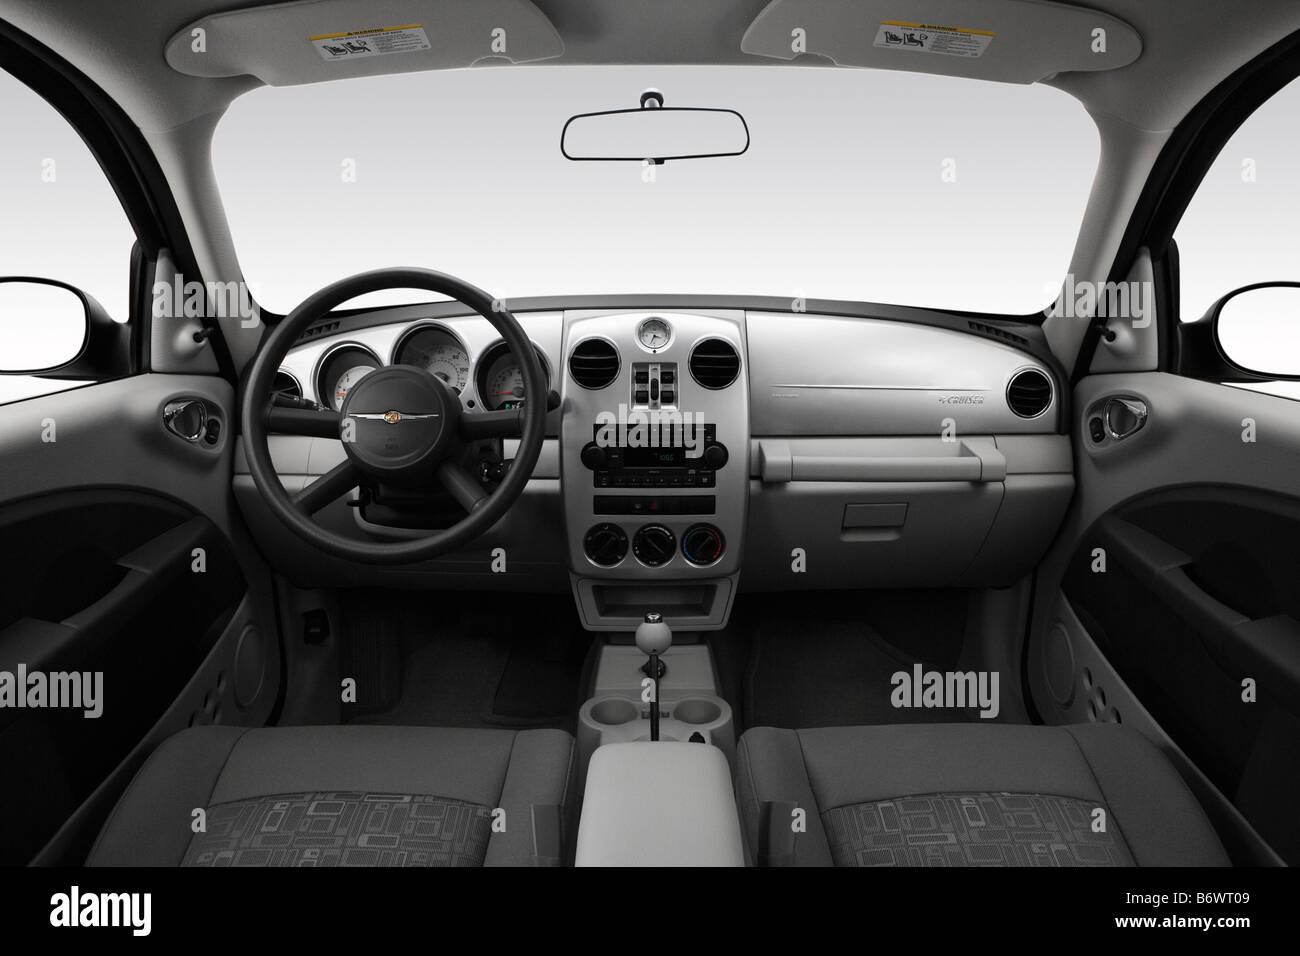 2009 chrysler pt cruiser in silver dashboard center console gear shifter view